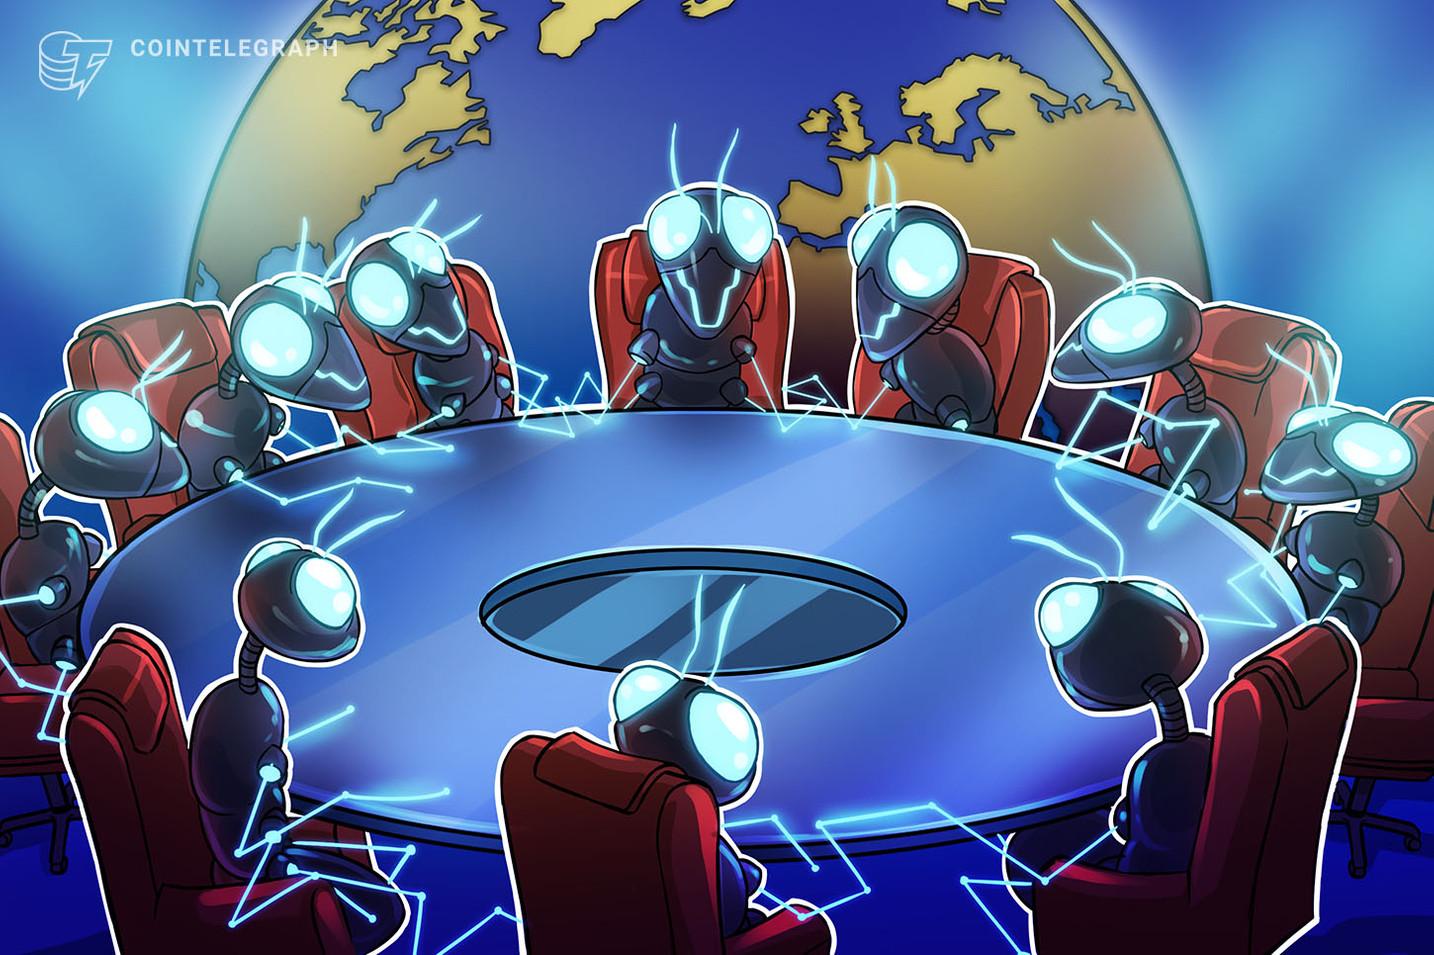 New ASEAN blockchain consortium targets cross-border cooperation